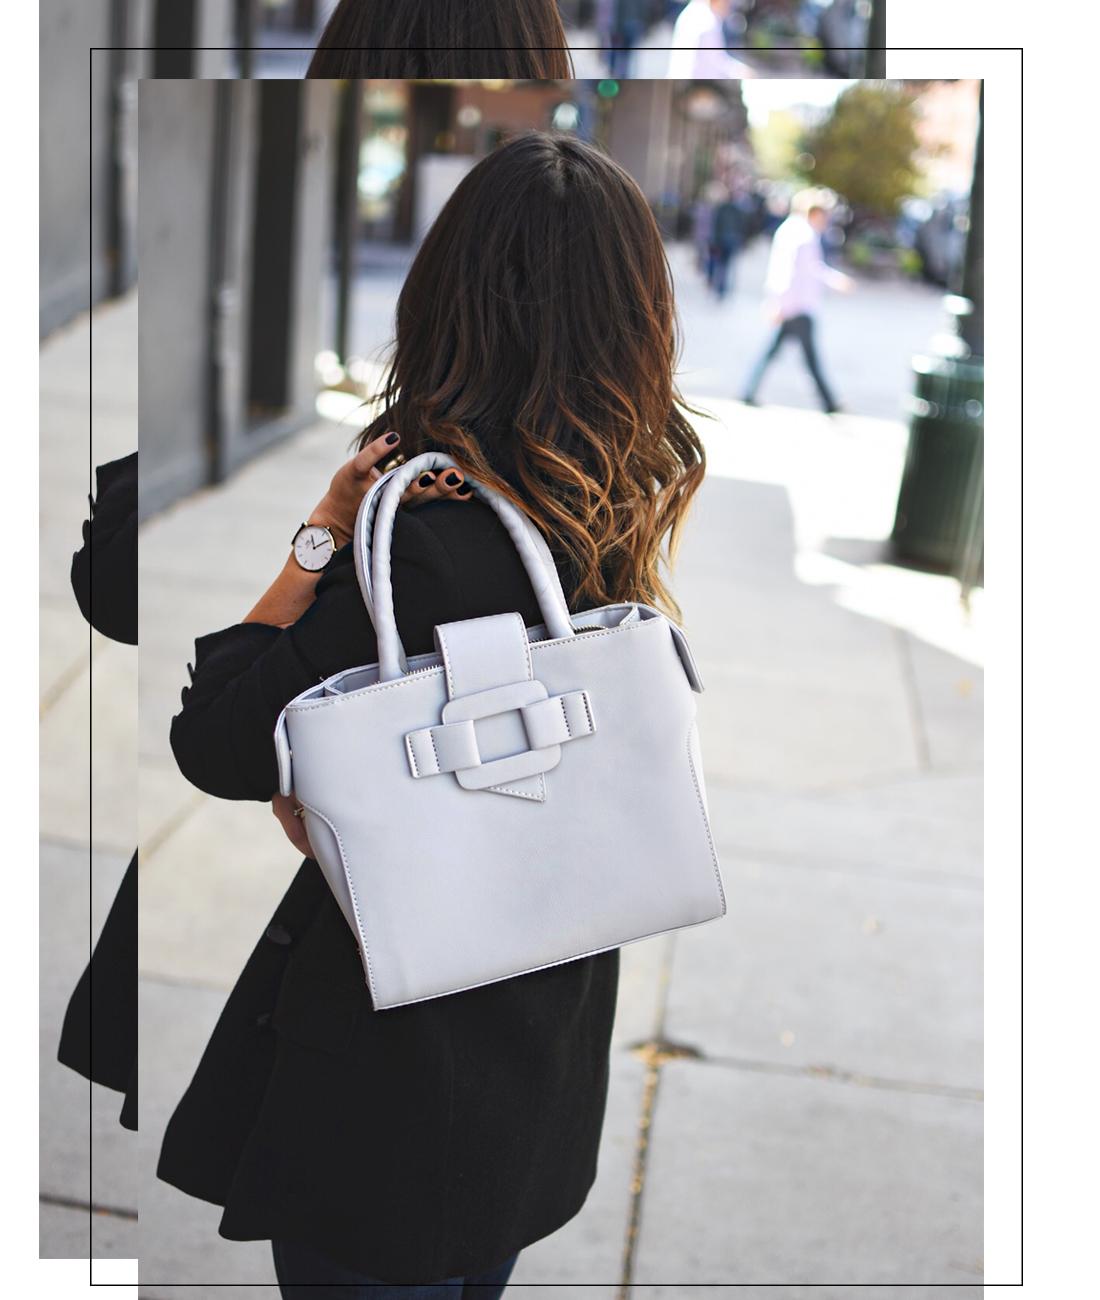 Carolina Hellal of Chic Talk wearing a VIPme faux leather grey bag